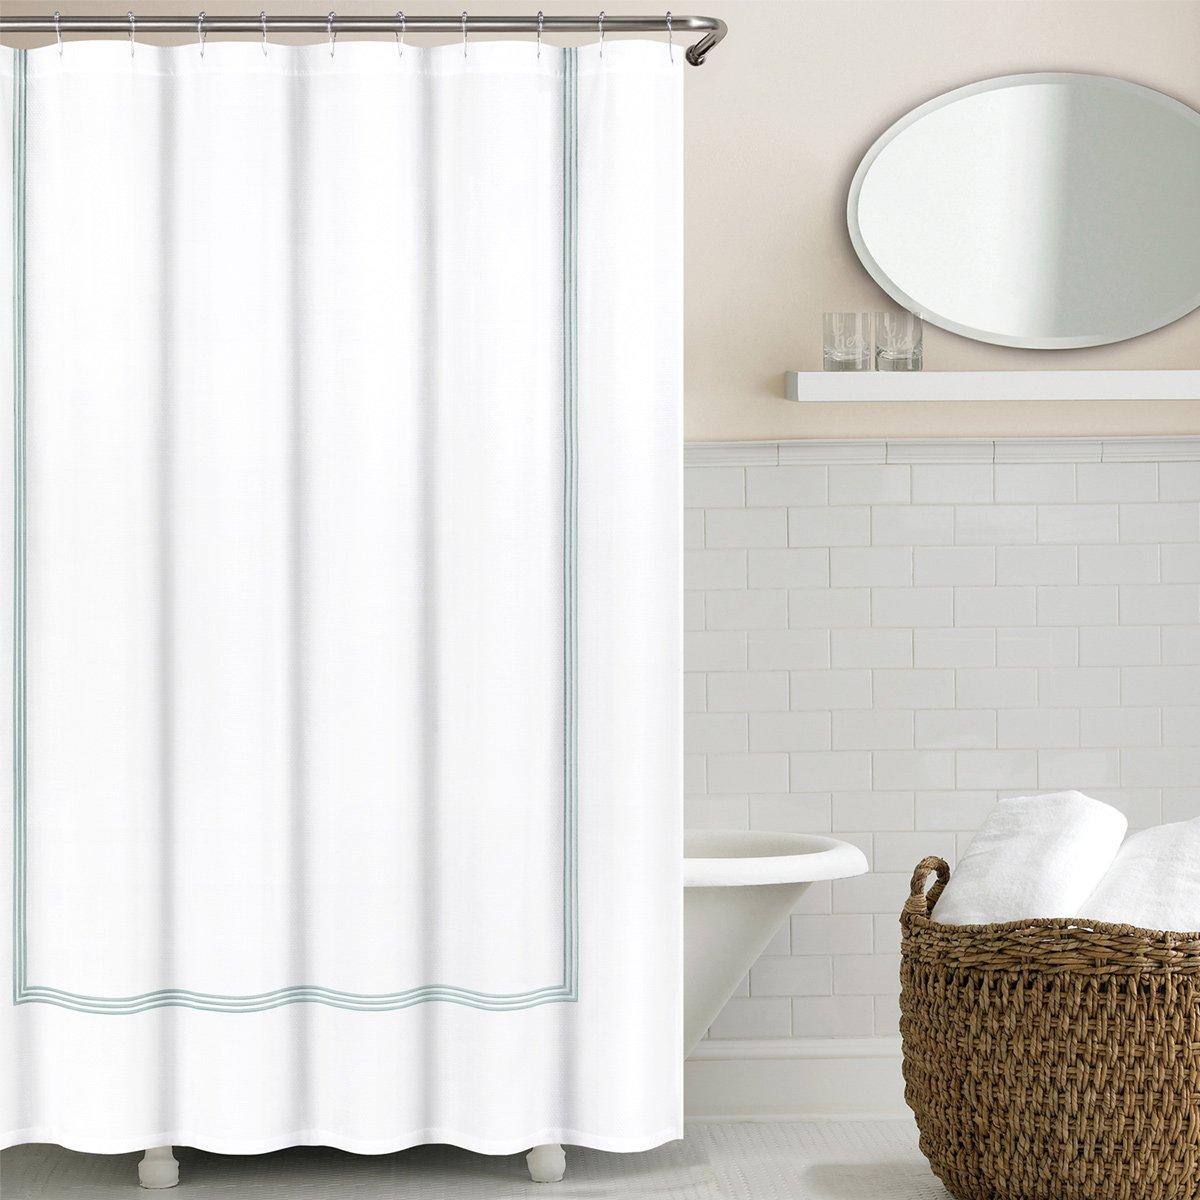 Echelon Home Hotel Collection Silver Blue Echelon Three Line Shower Curtain,